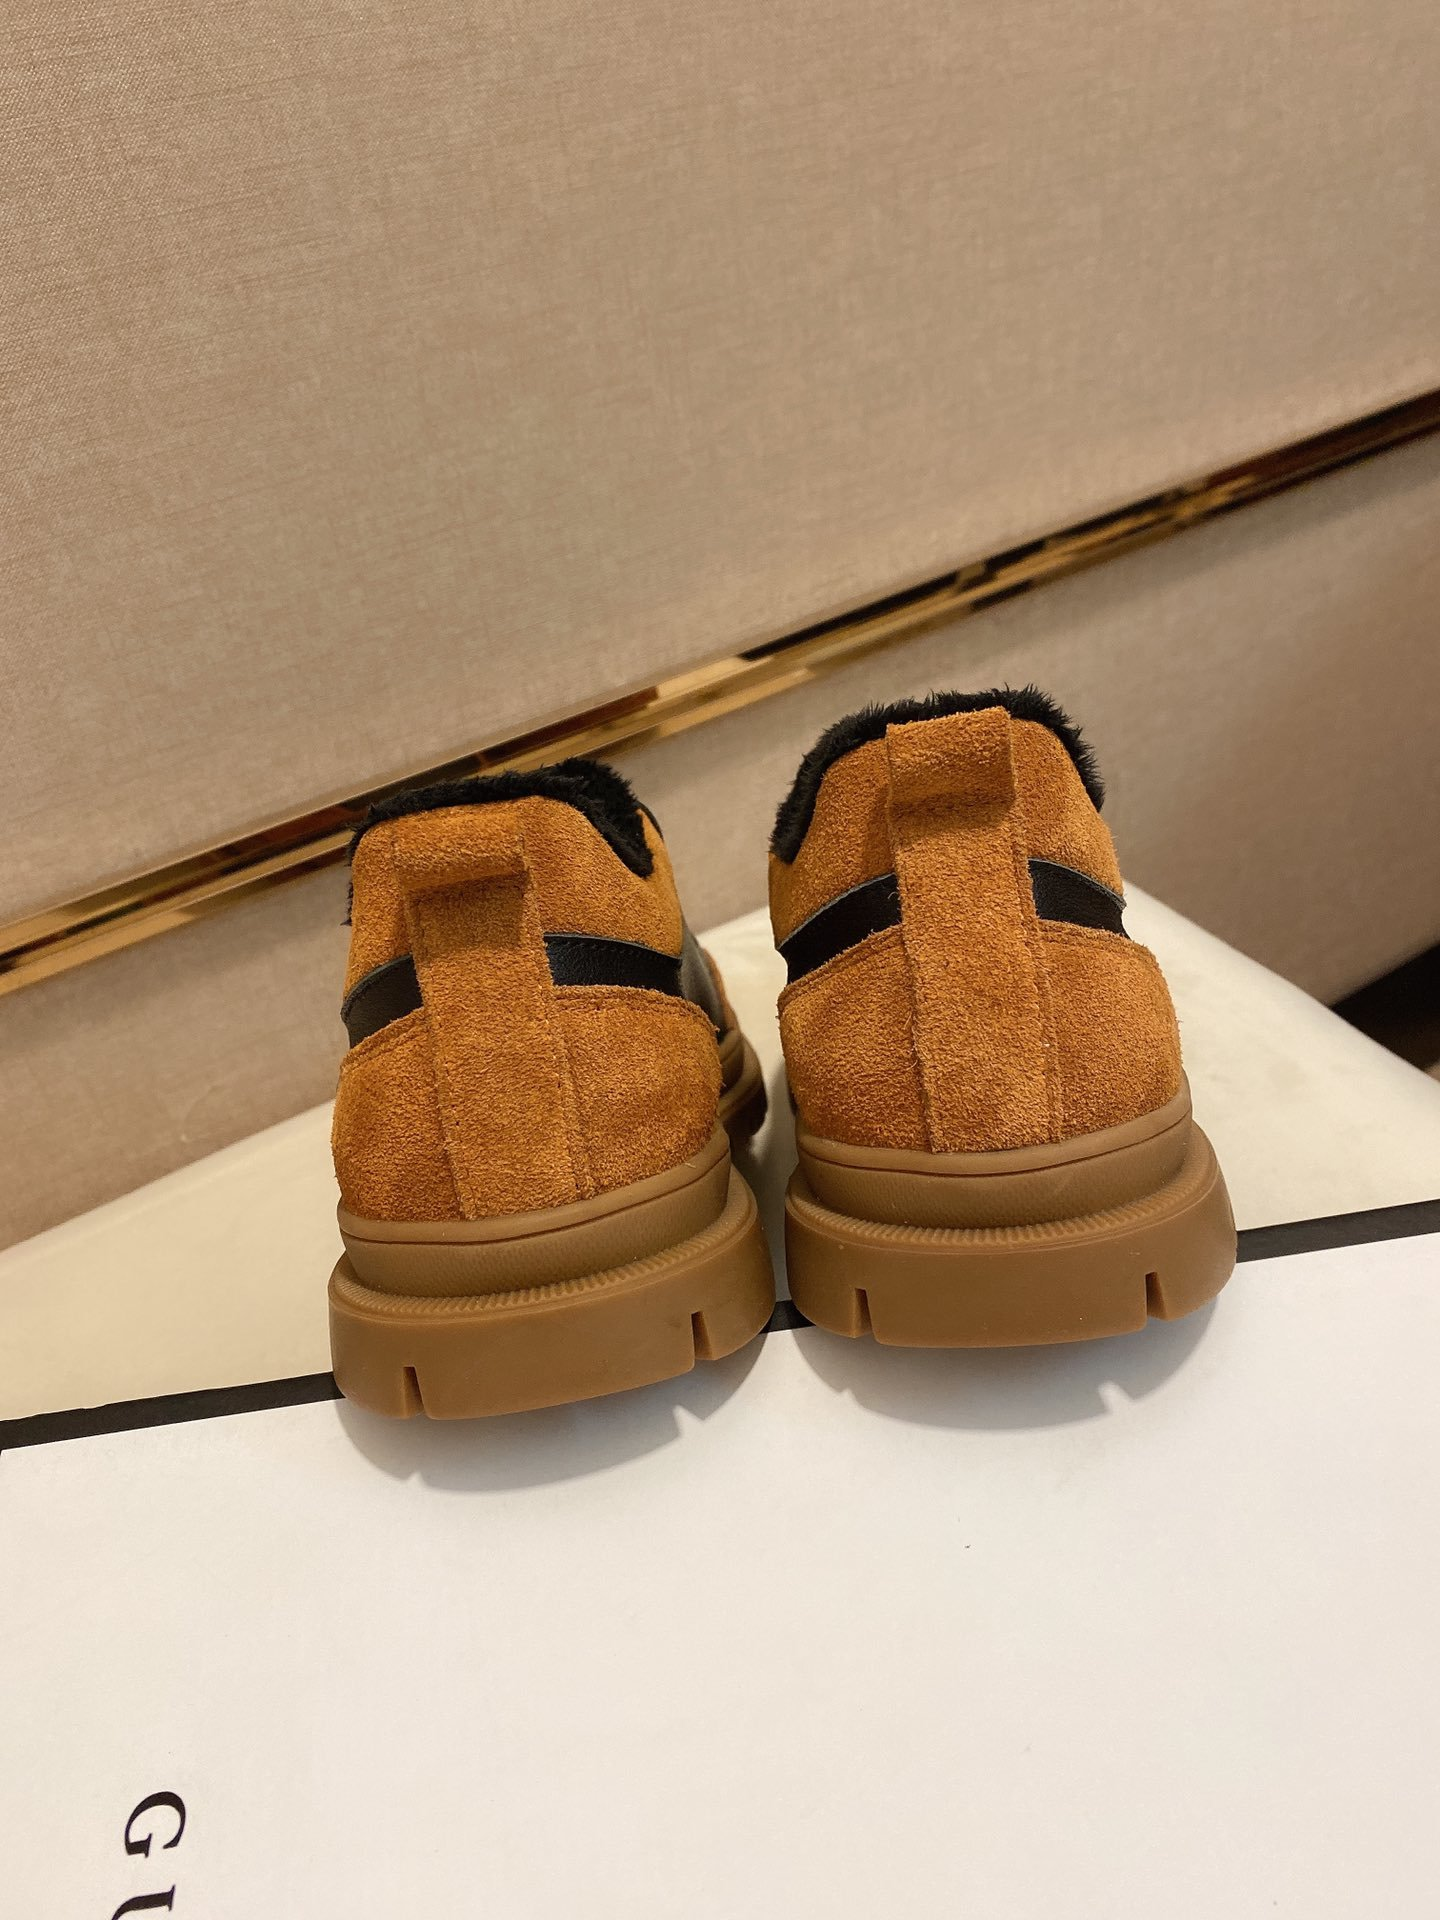 Gucci古奇2019男士最新休闲鞋